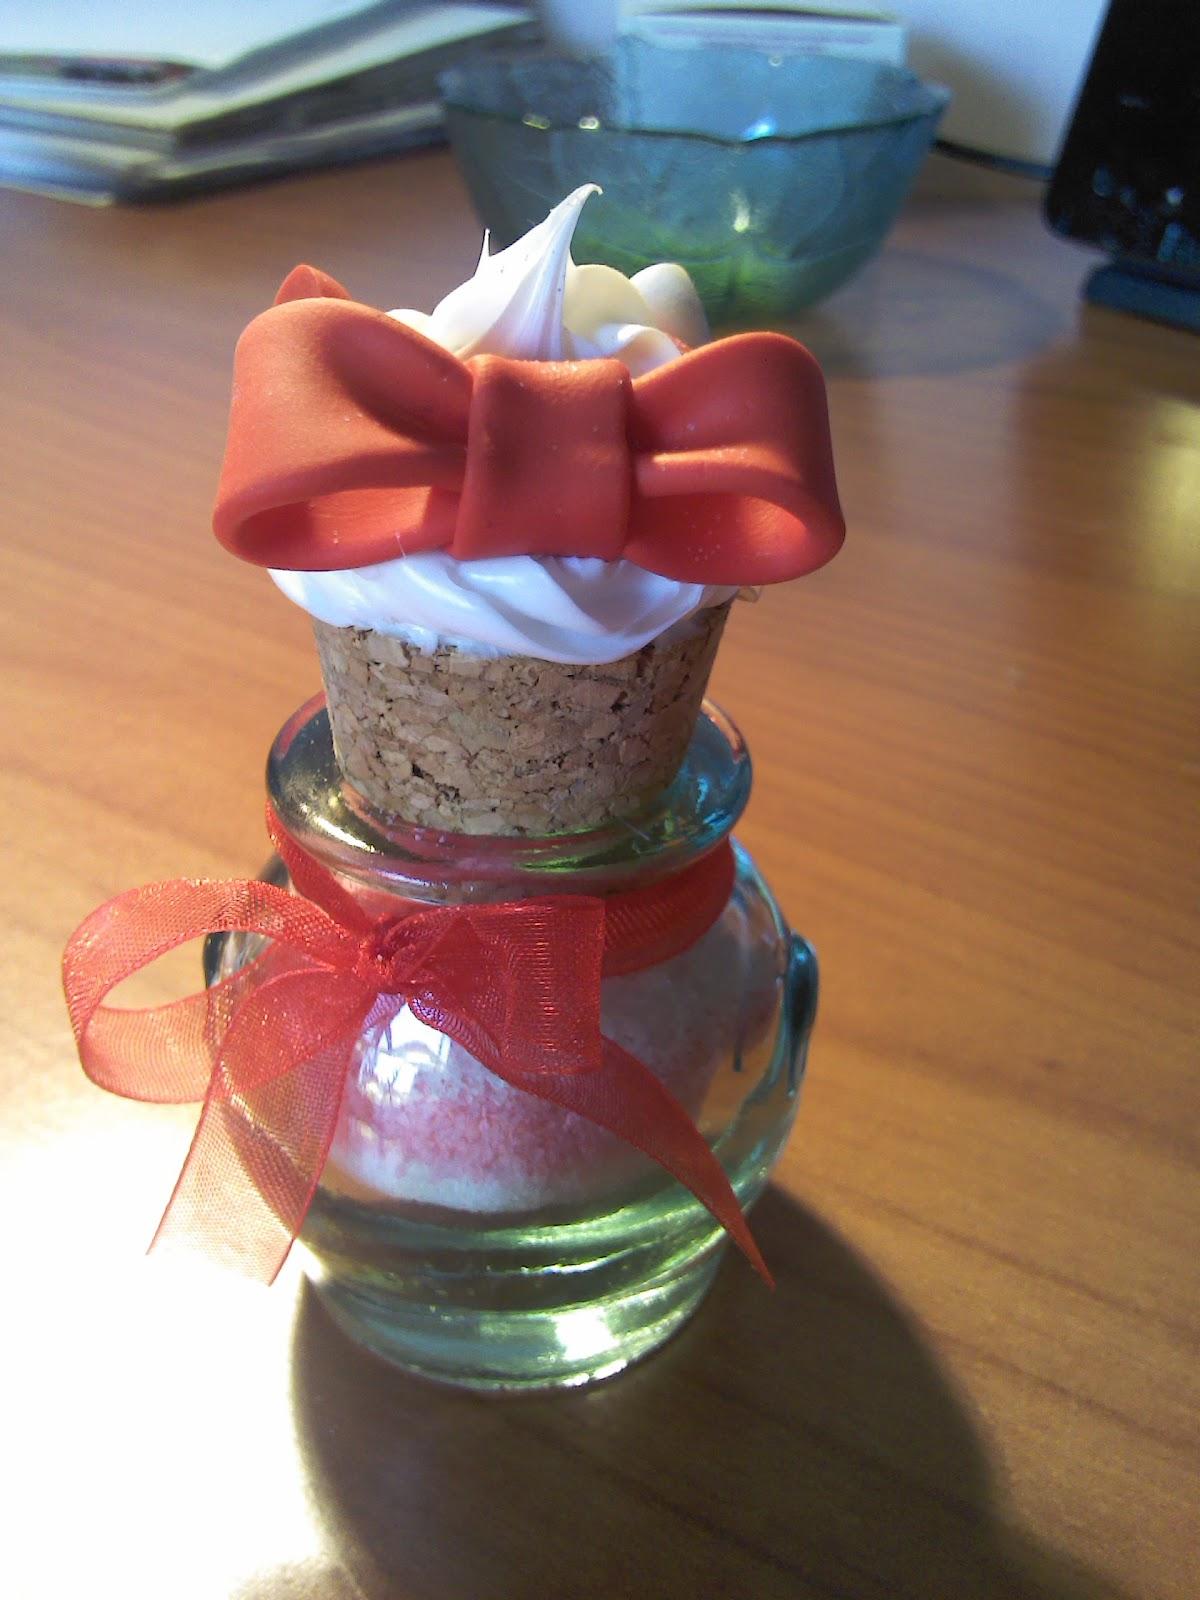 Dolci fantasie in fimo vasetti decorati - Vasetti vetro decorati ...